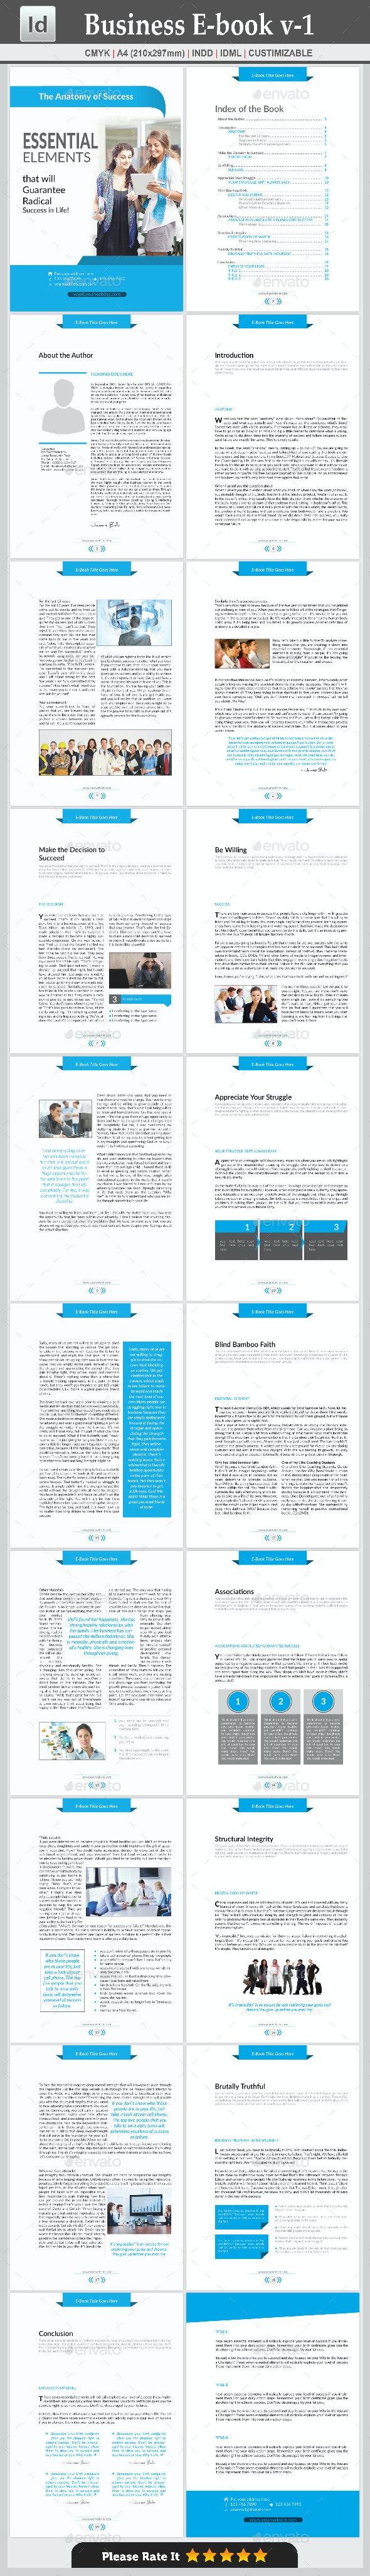 Business E-book v-1 - Digital Books ePublishing